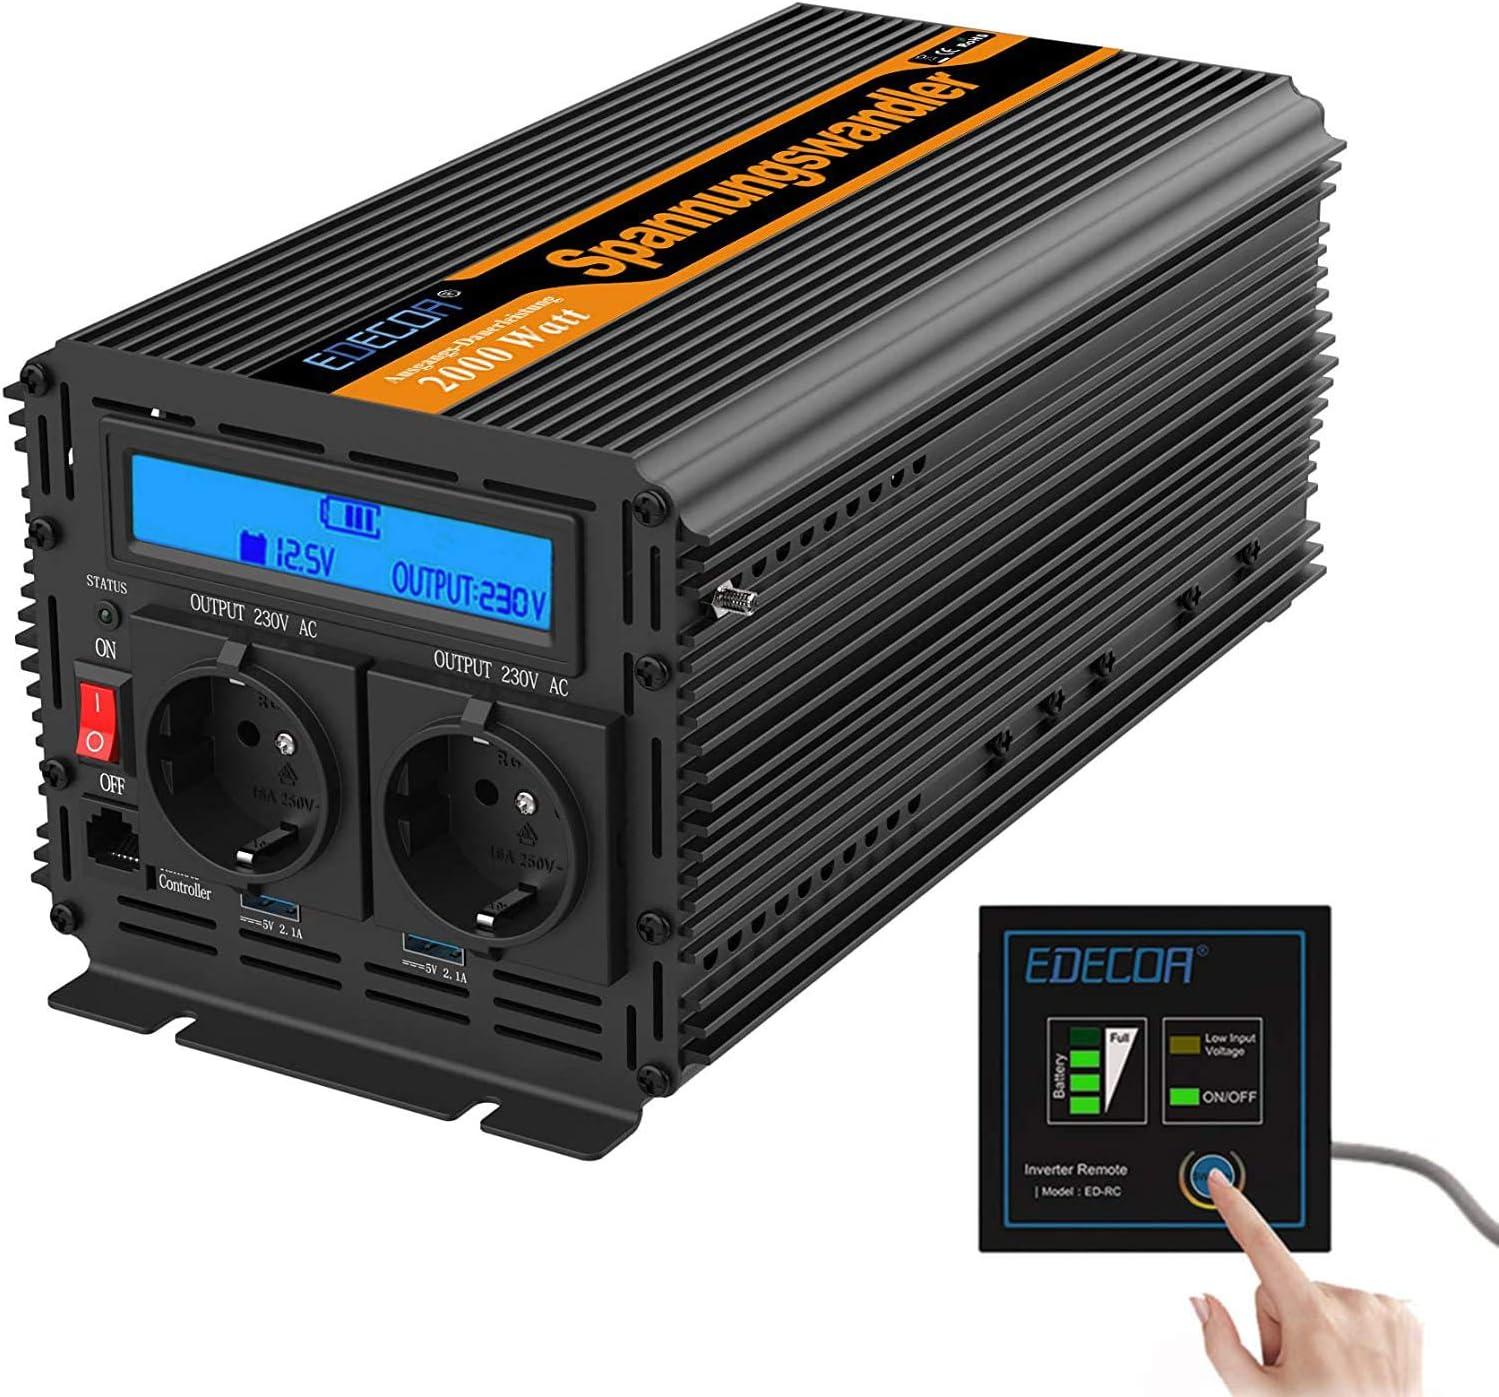 EDECOA Conversor 2000w Inversor 12v 220v 230v 2x USB pantalla LCD y mando a distancia Transformador onda modificada 2000w y pico momentaneo de 4000w inversor para instalacion solar